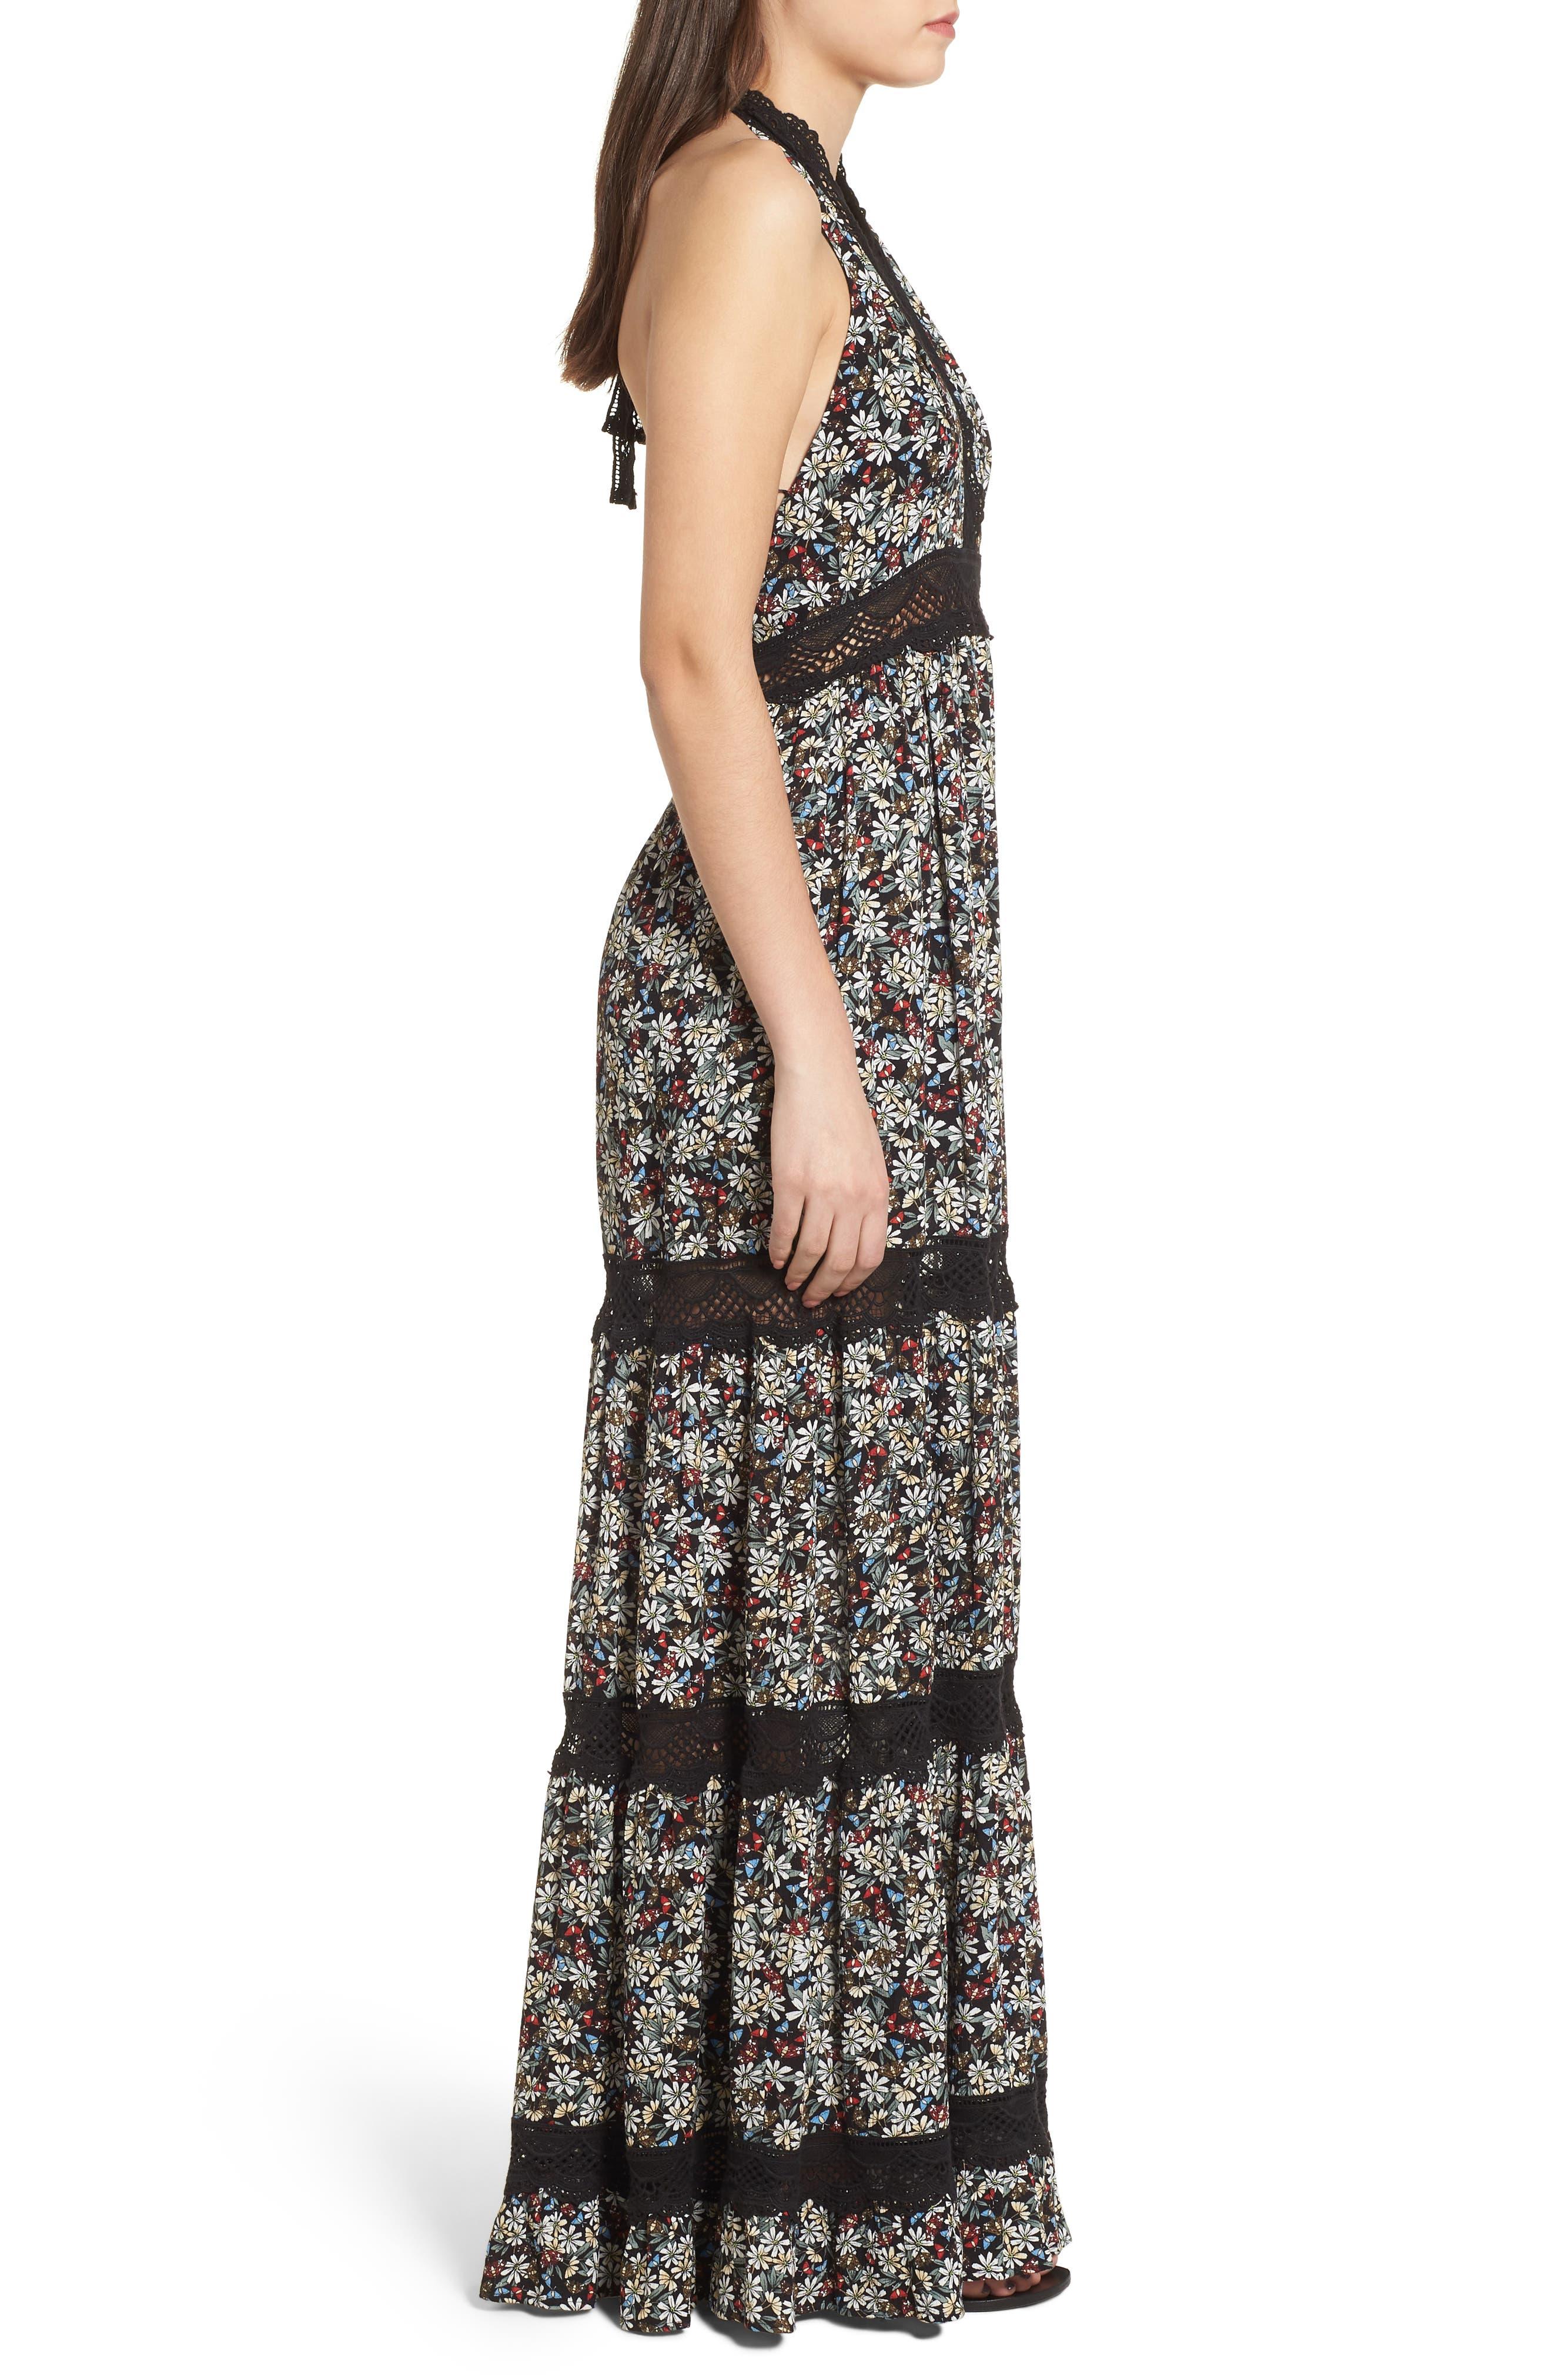 Flora Halter Neck Maxi Dress,                             Alternate thumbnail 3, color,                             004